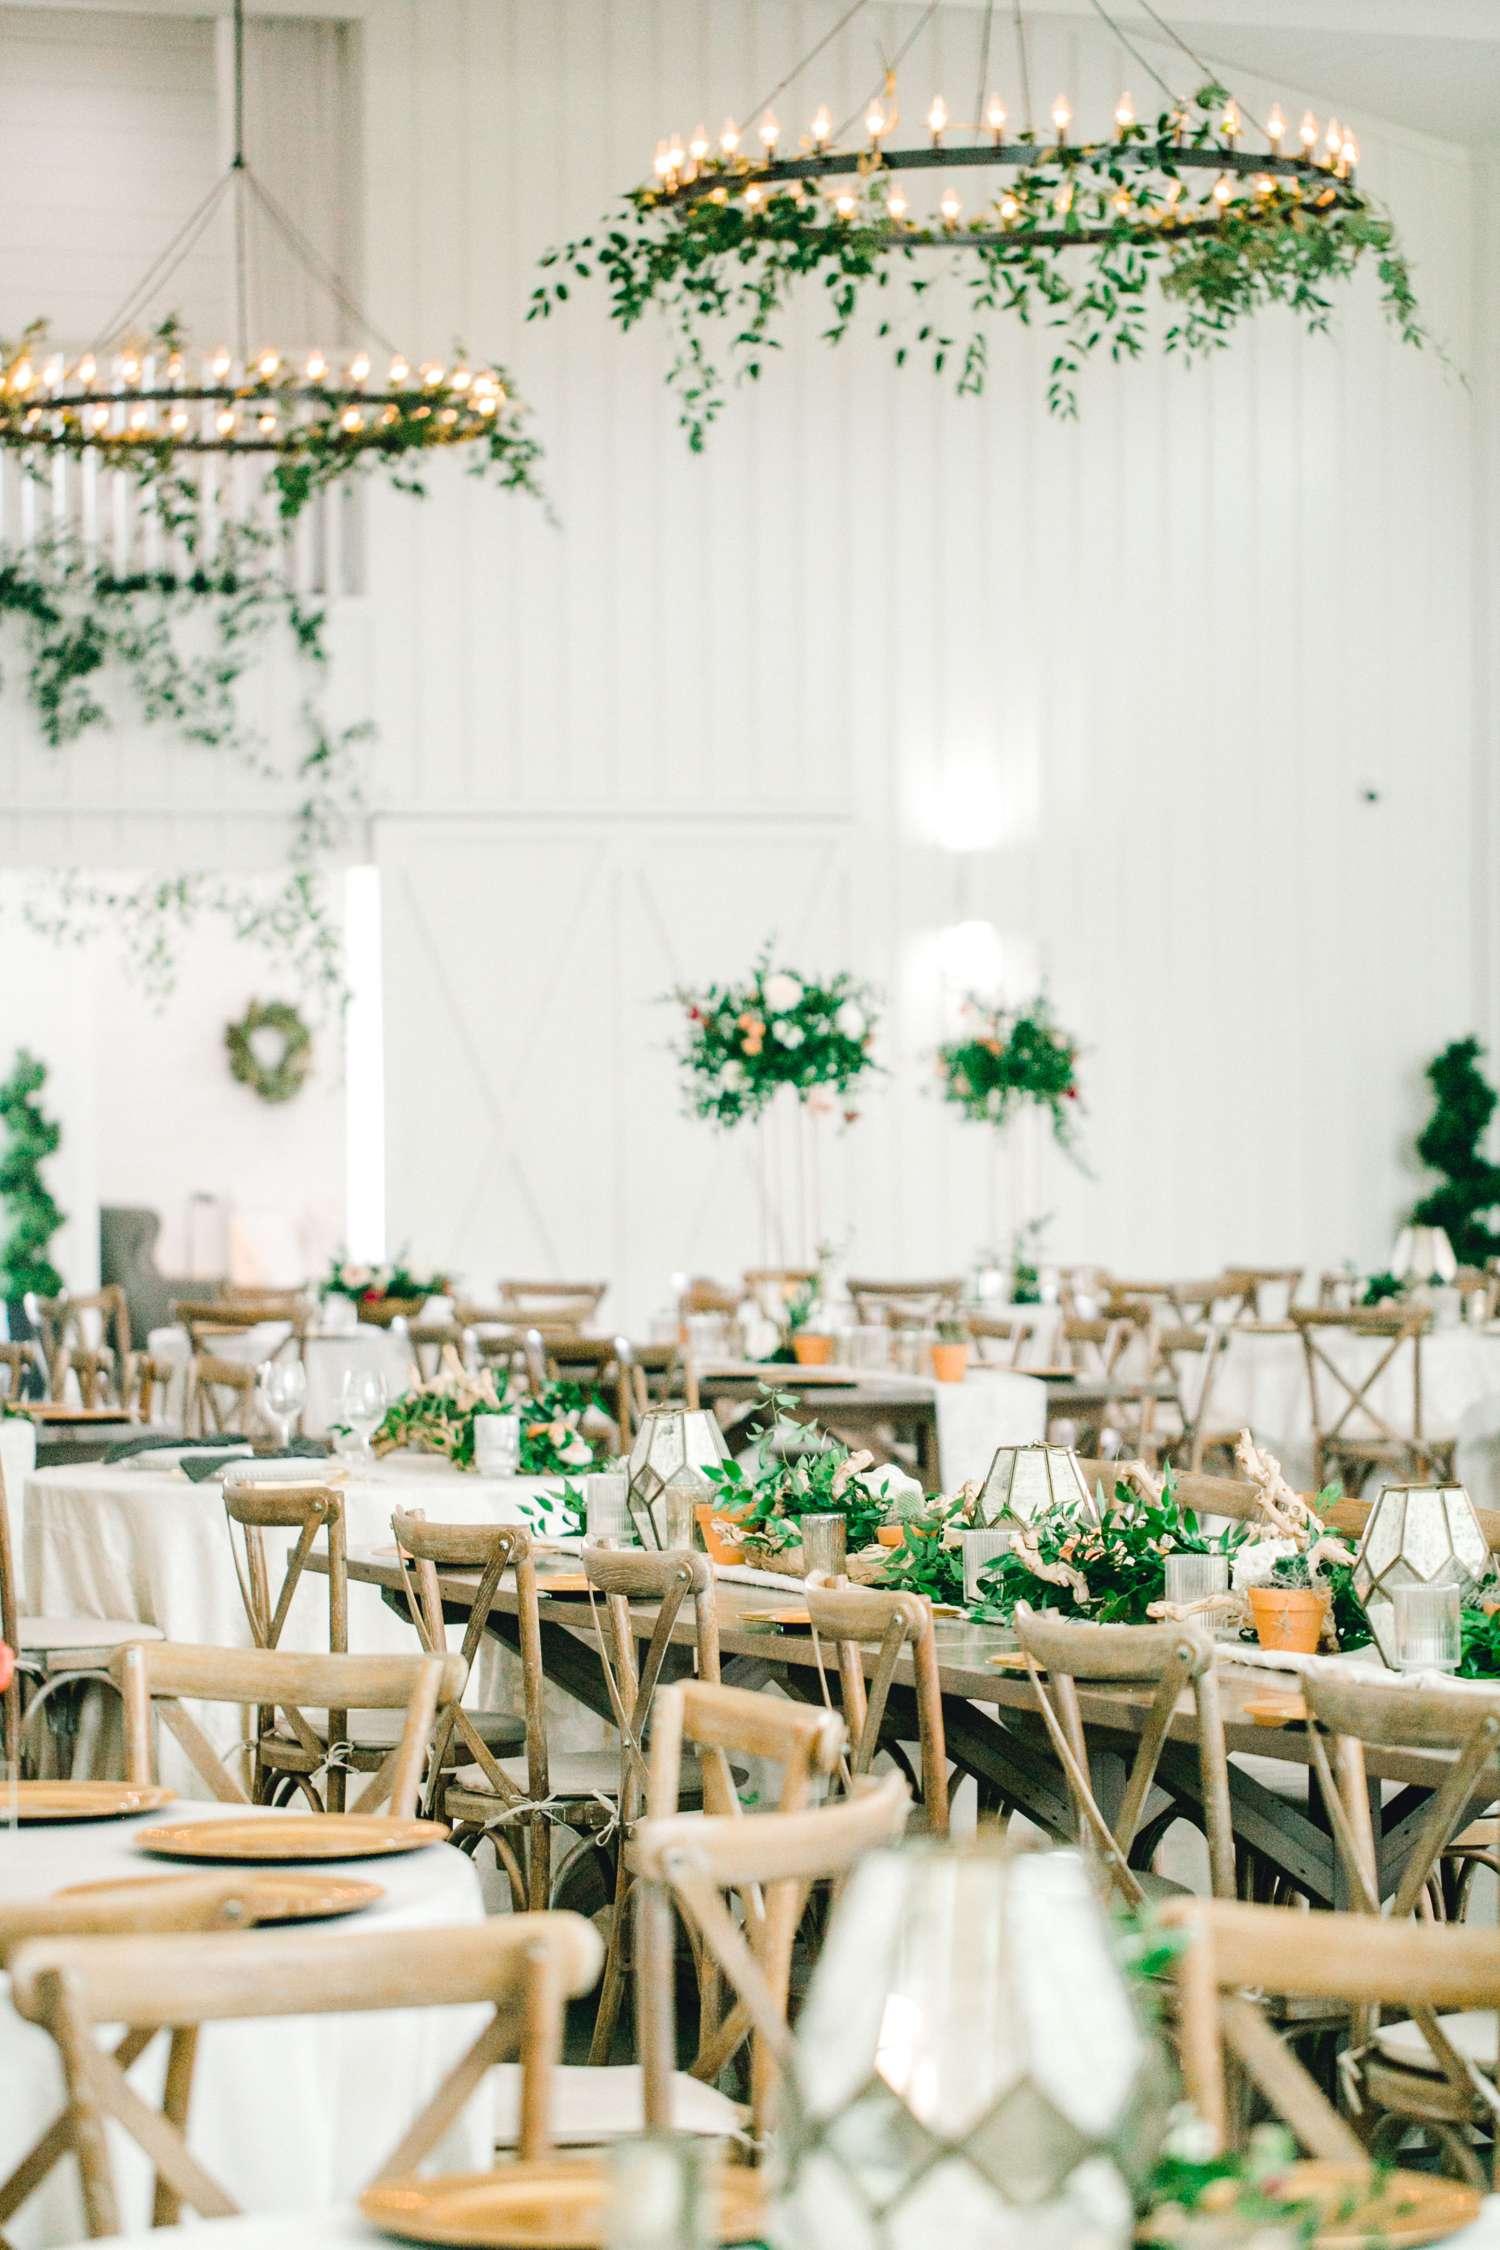 HEBERT_MORGAN_AND_CLAY_ALLEEJ_THE_FARMHOUSE_MONTGOMERY_TEXAS_WEDDING_0123.jpg